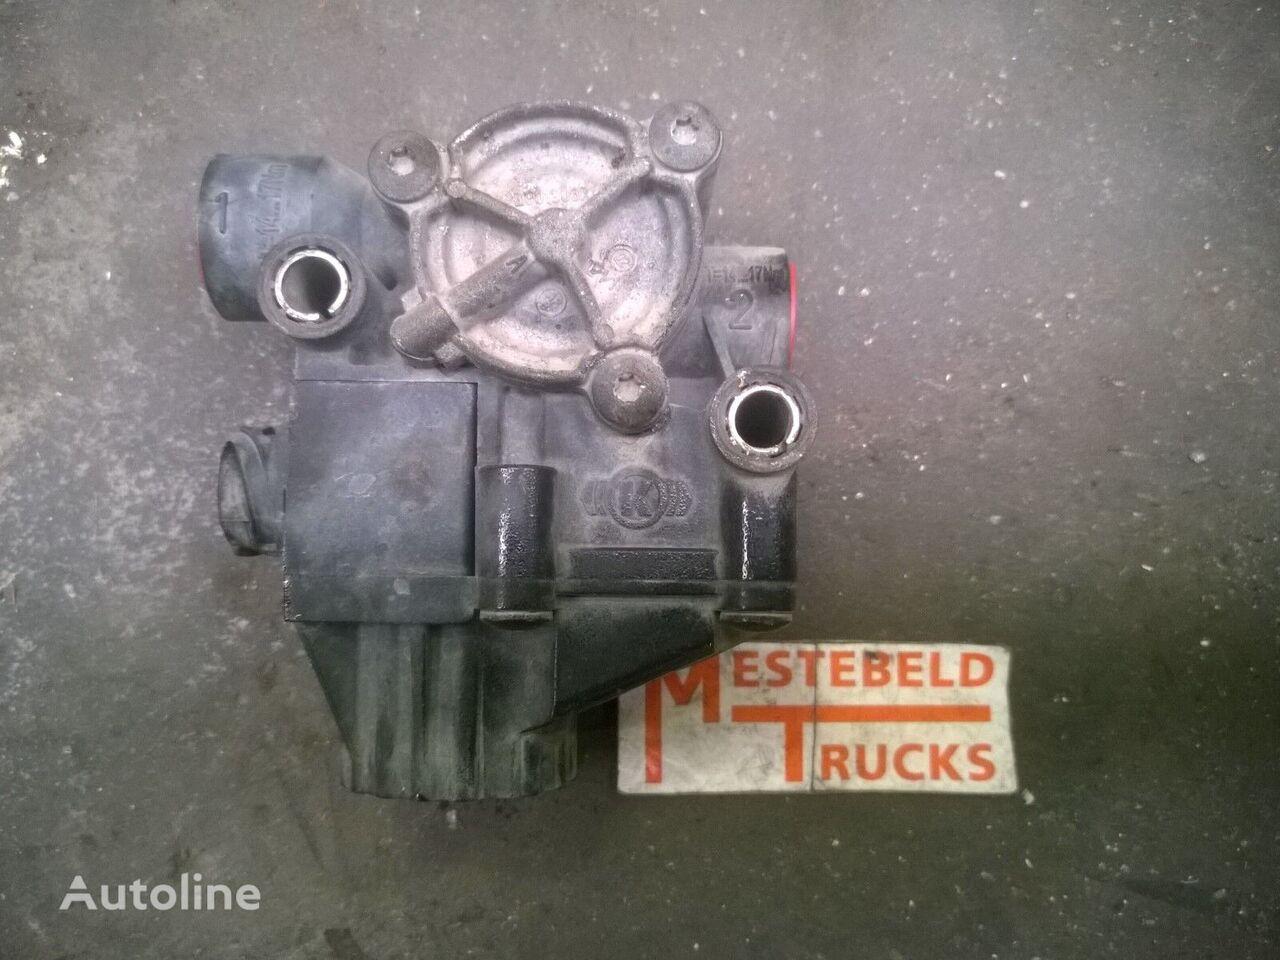 MAN ABS magneetventiel valve for MAN ABS magneetventiel L2000 truck